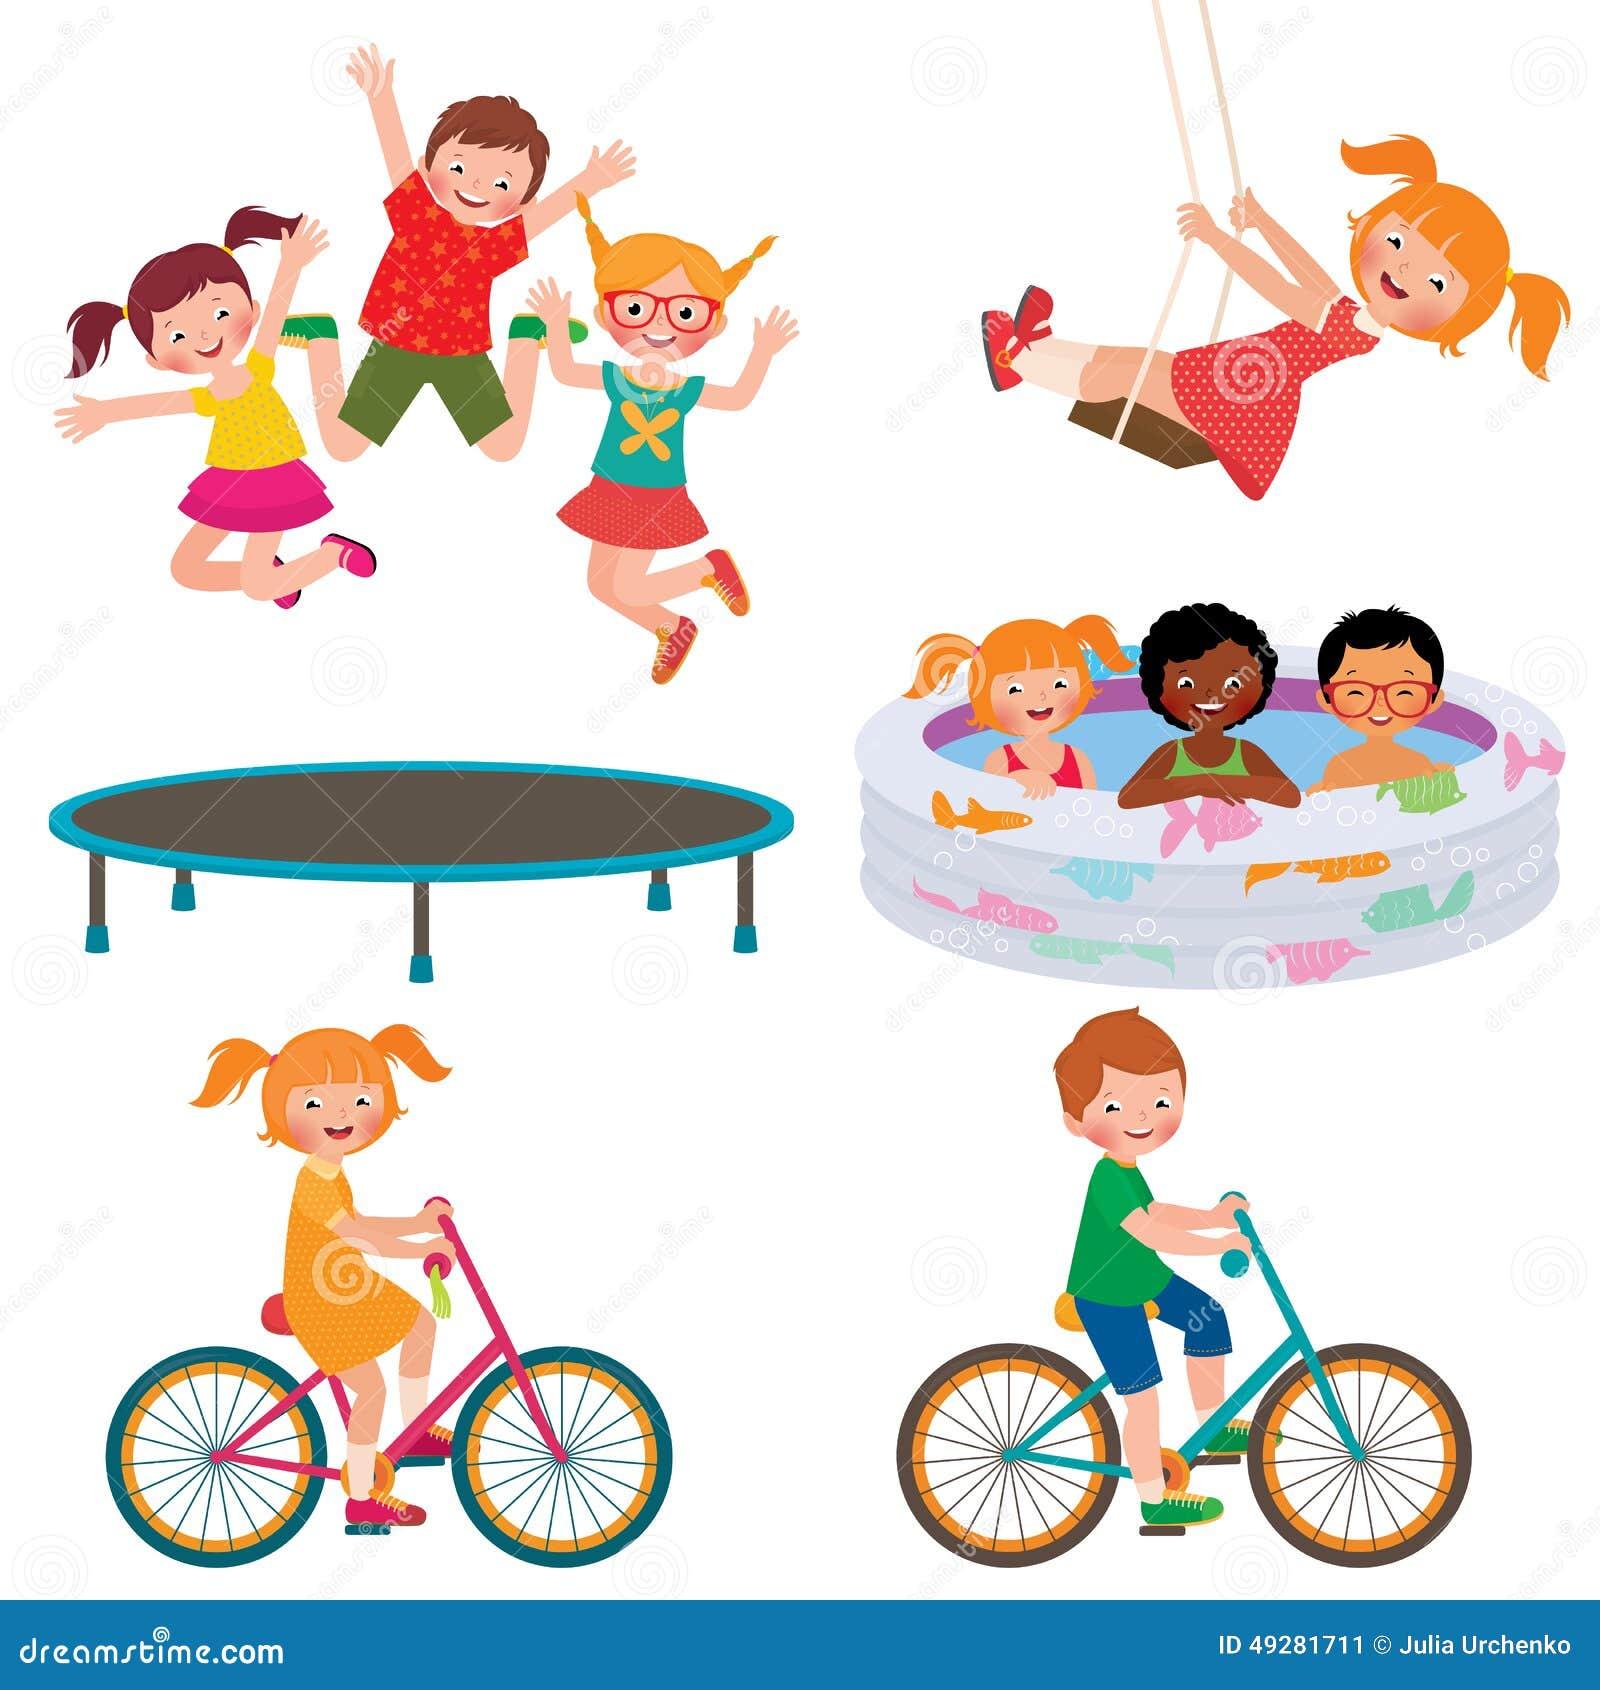 Stock Vector cartoon illustration of summer children activities.